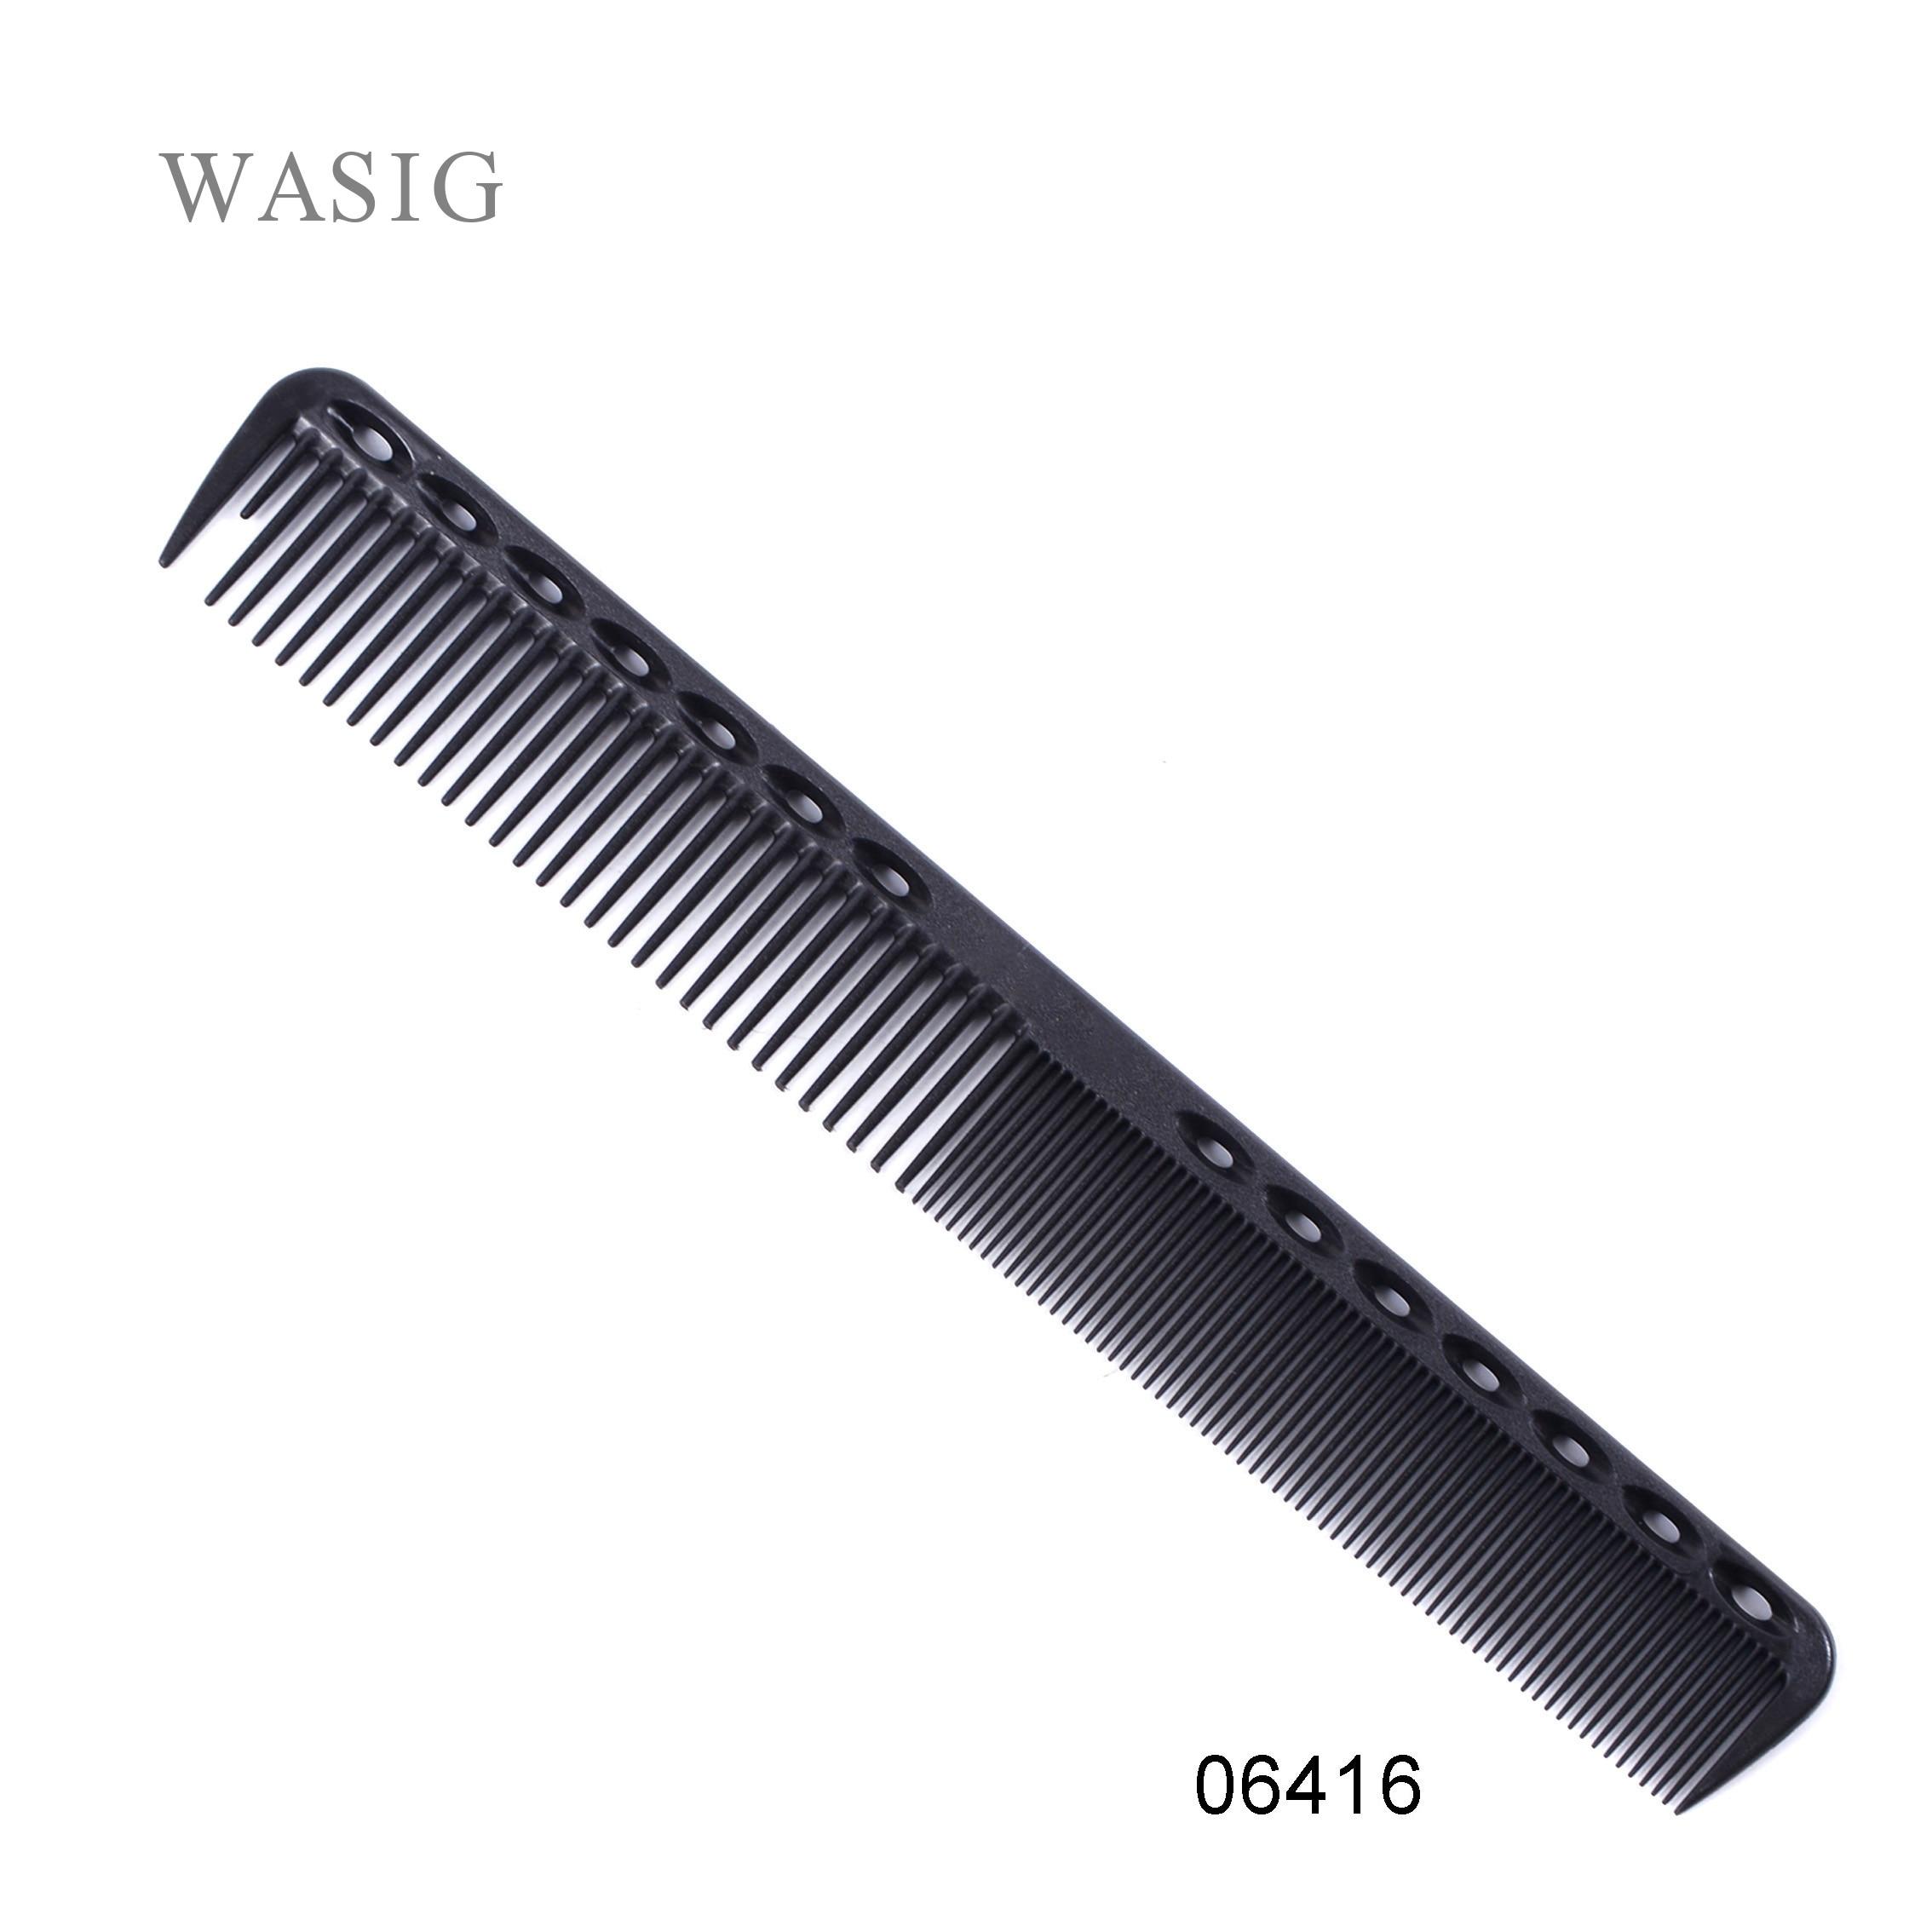 1 Pc Professional Hair Cricket Comb Heat Resistant Medium Cutting Carbon Comb Salon Antistatic Barber Styling Brush Tool